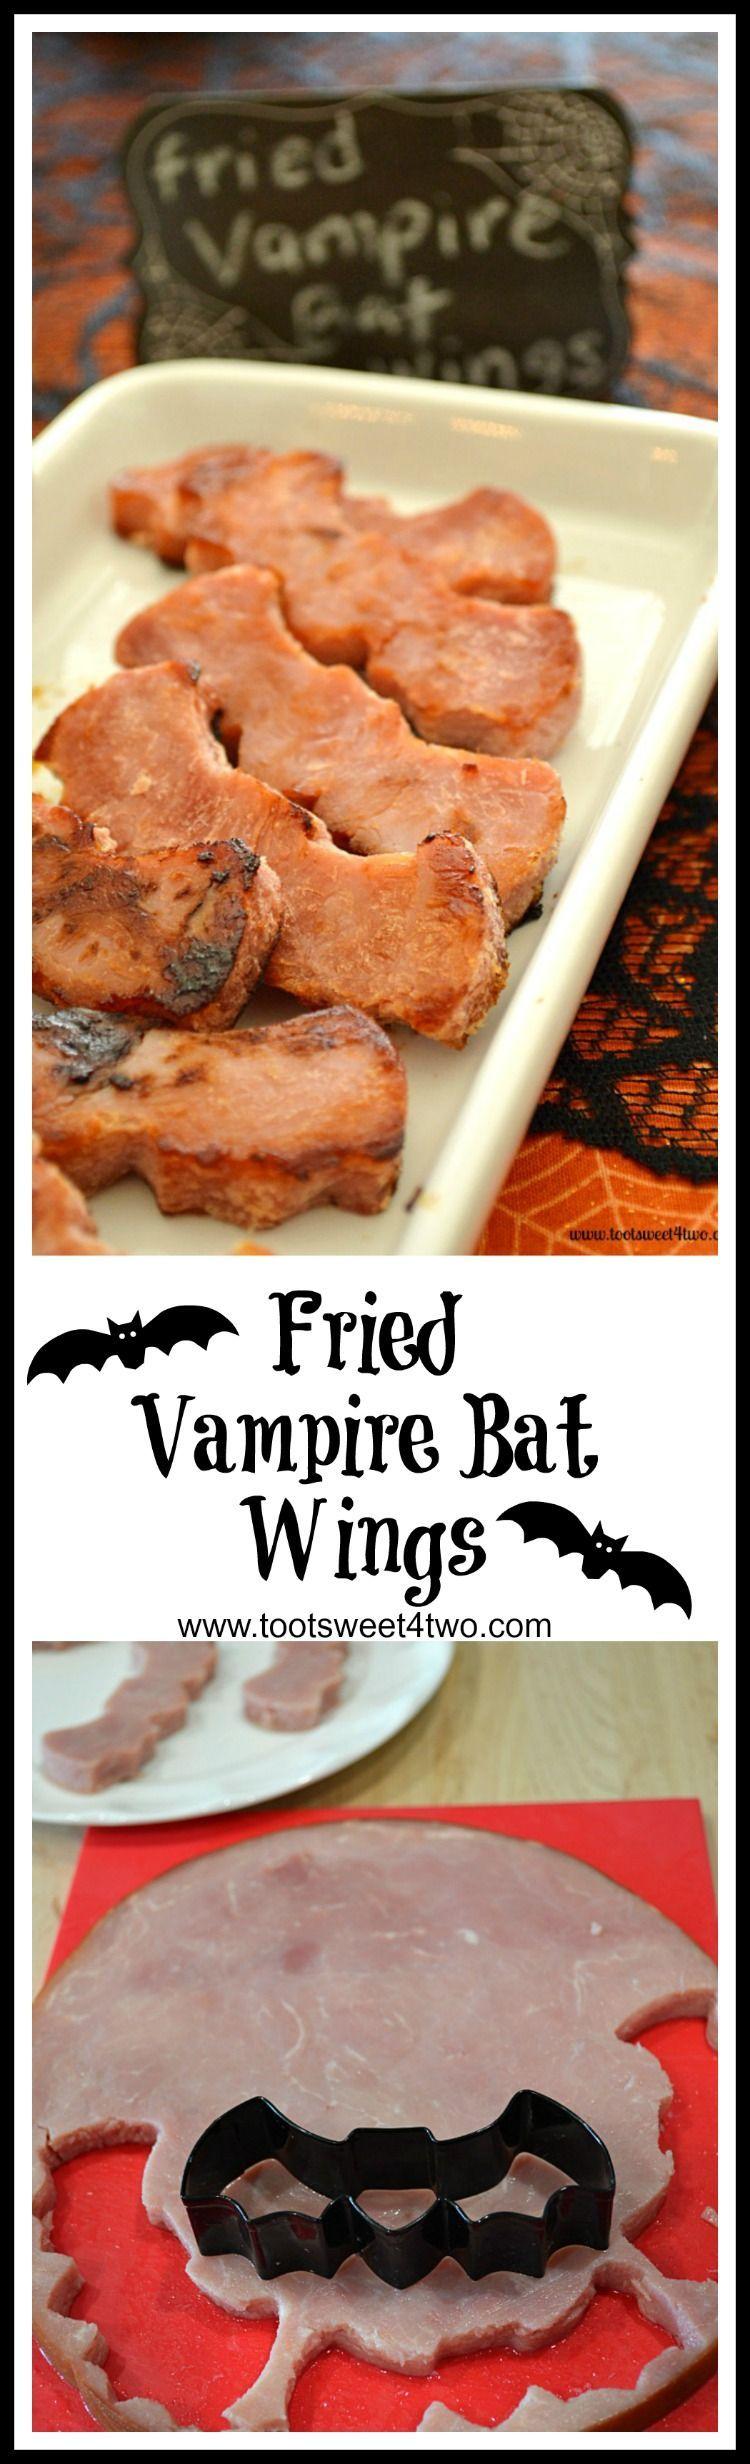 Fried Vampire Bat Wings: Make Your Halloween Breakfast Scary Fun! - Toot Sweet 4 Two